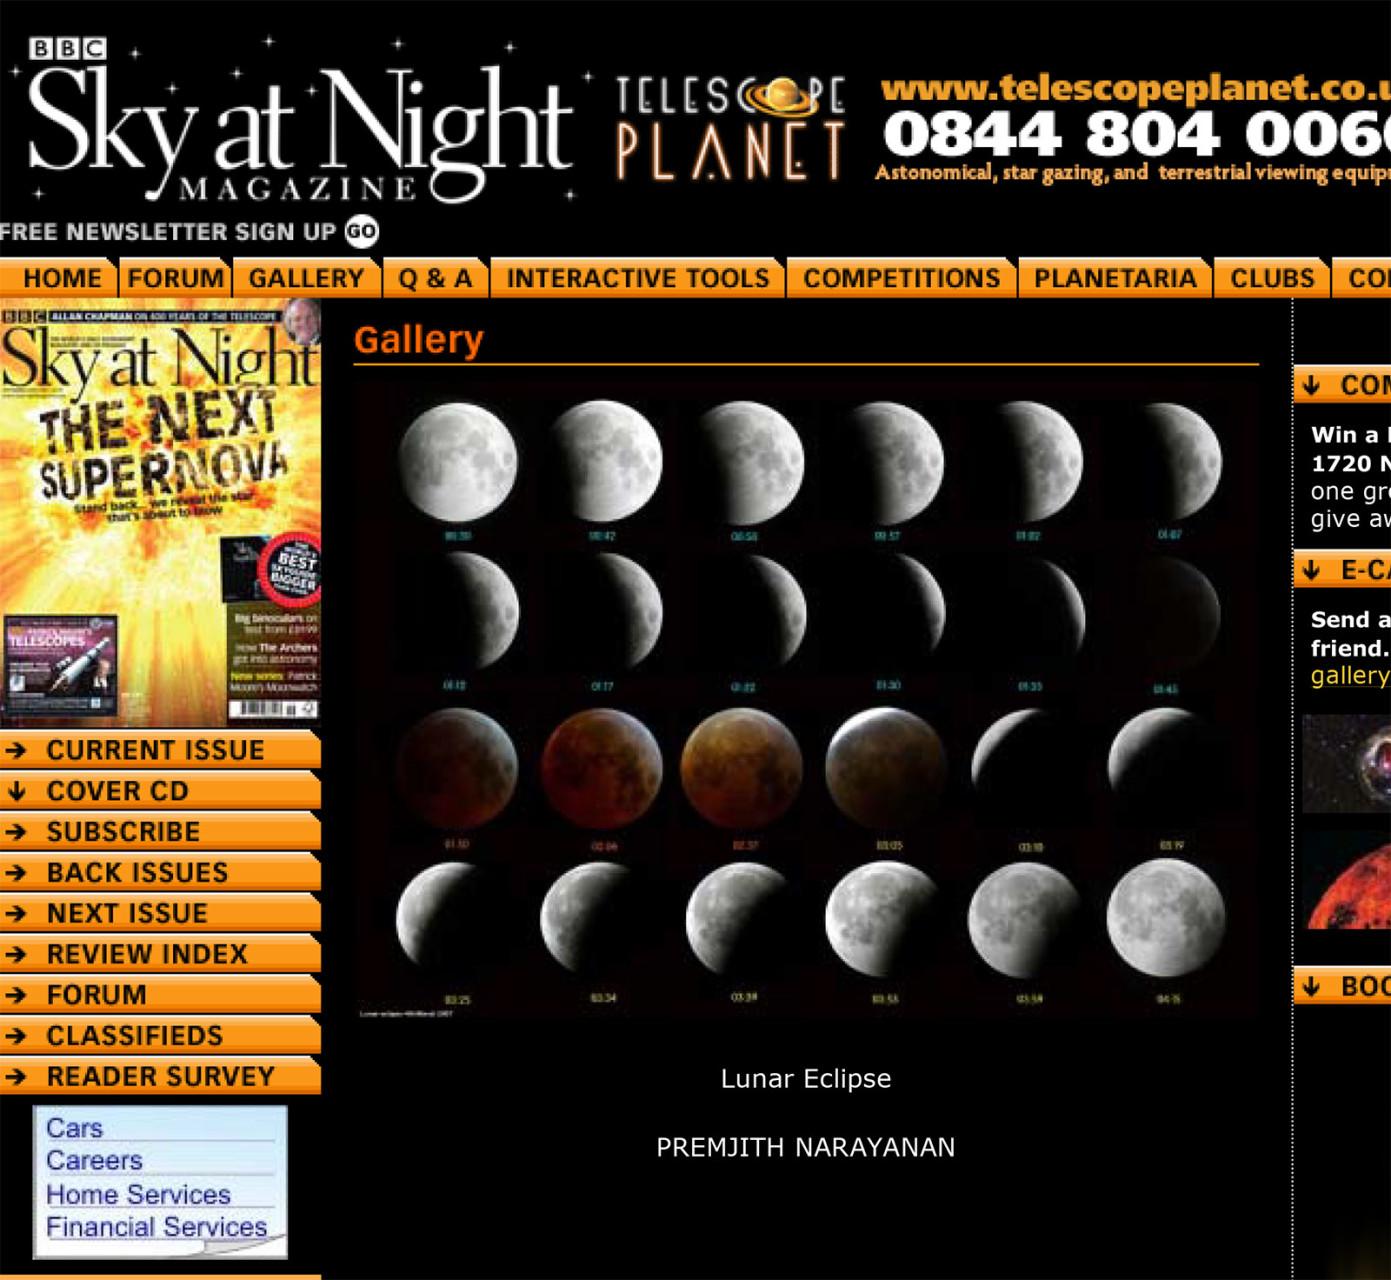 http://www.skyatnightmagazine.com/ecardform.asp?ID=41671